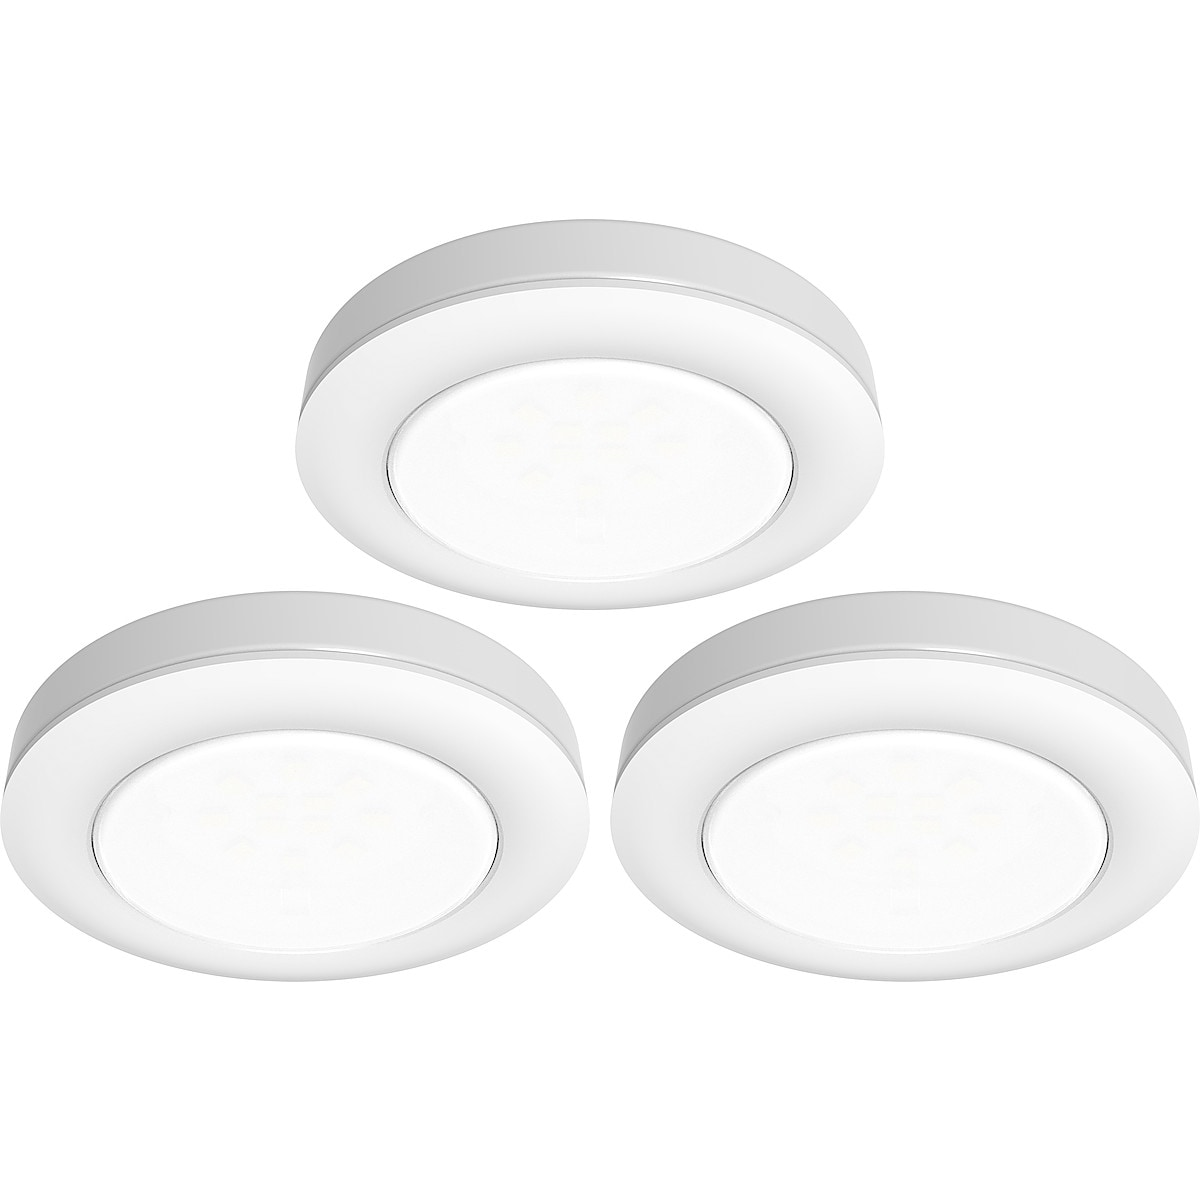 Downlight LED 3-pack, Cotech